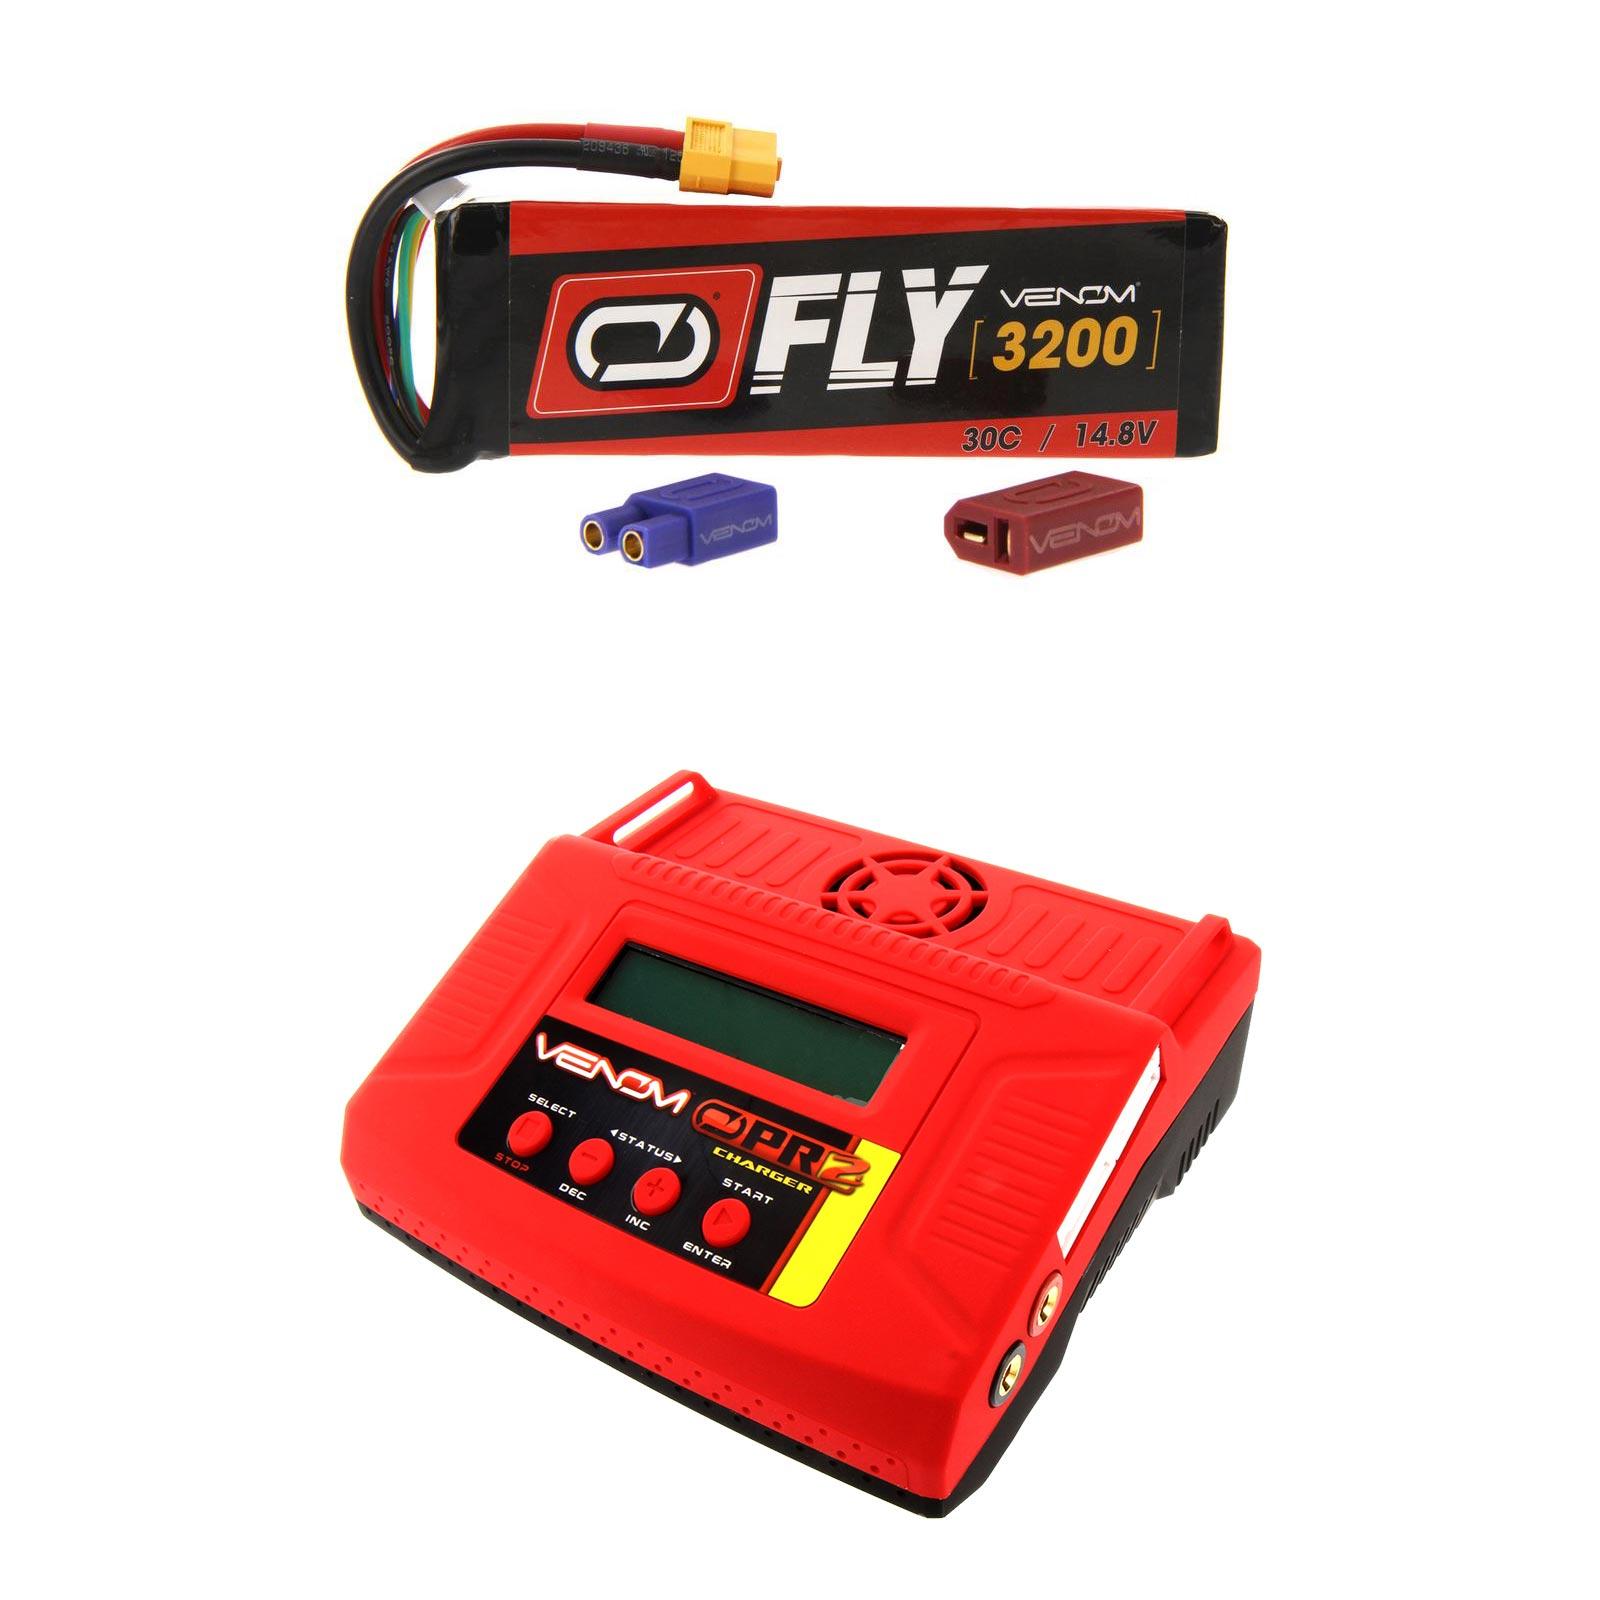 Venom Fly 30C 4S 3200mAh 14.8V LiPo Battery with UNI 2.0 Plug and Venom Pro 2 LiPo Battery & NiMH Battery Charger Money... by Venom